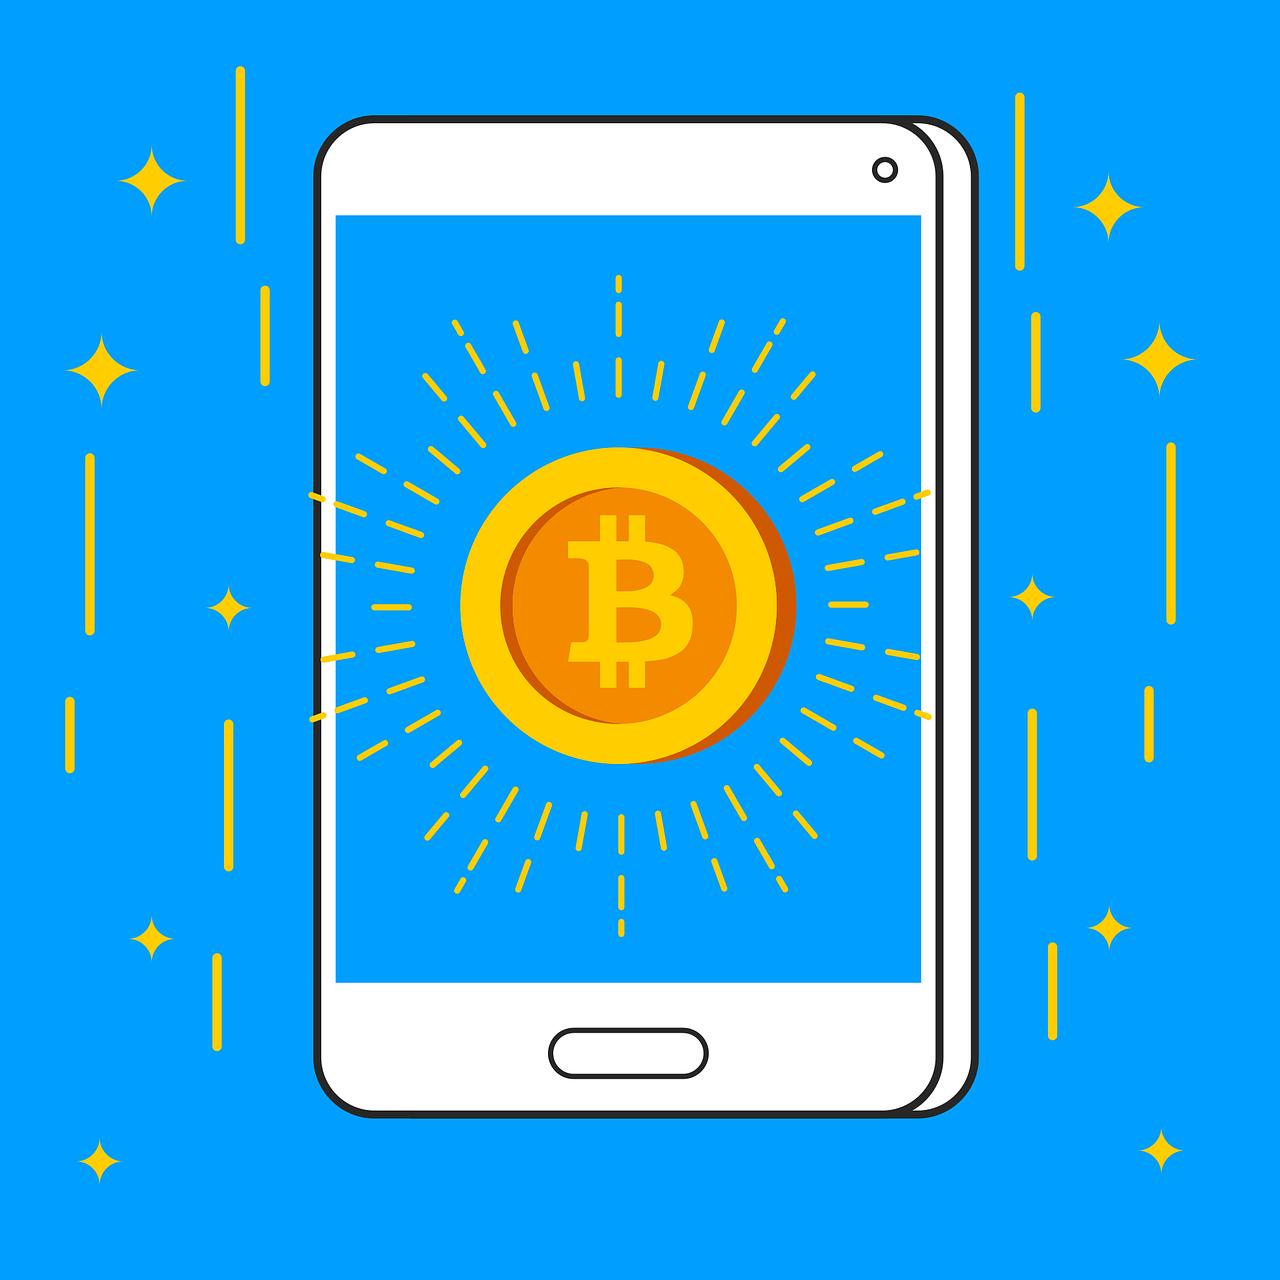 bitcoin atm világszerte a bitcoin kereskedő jó